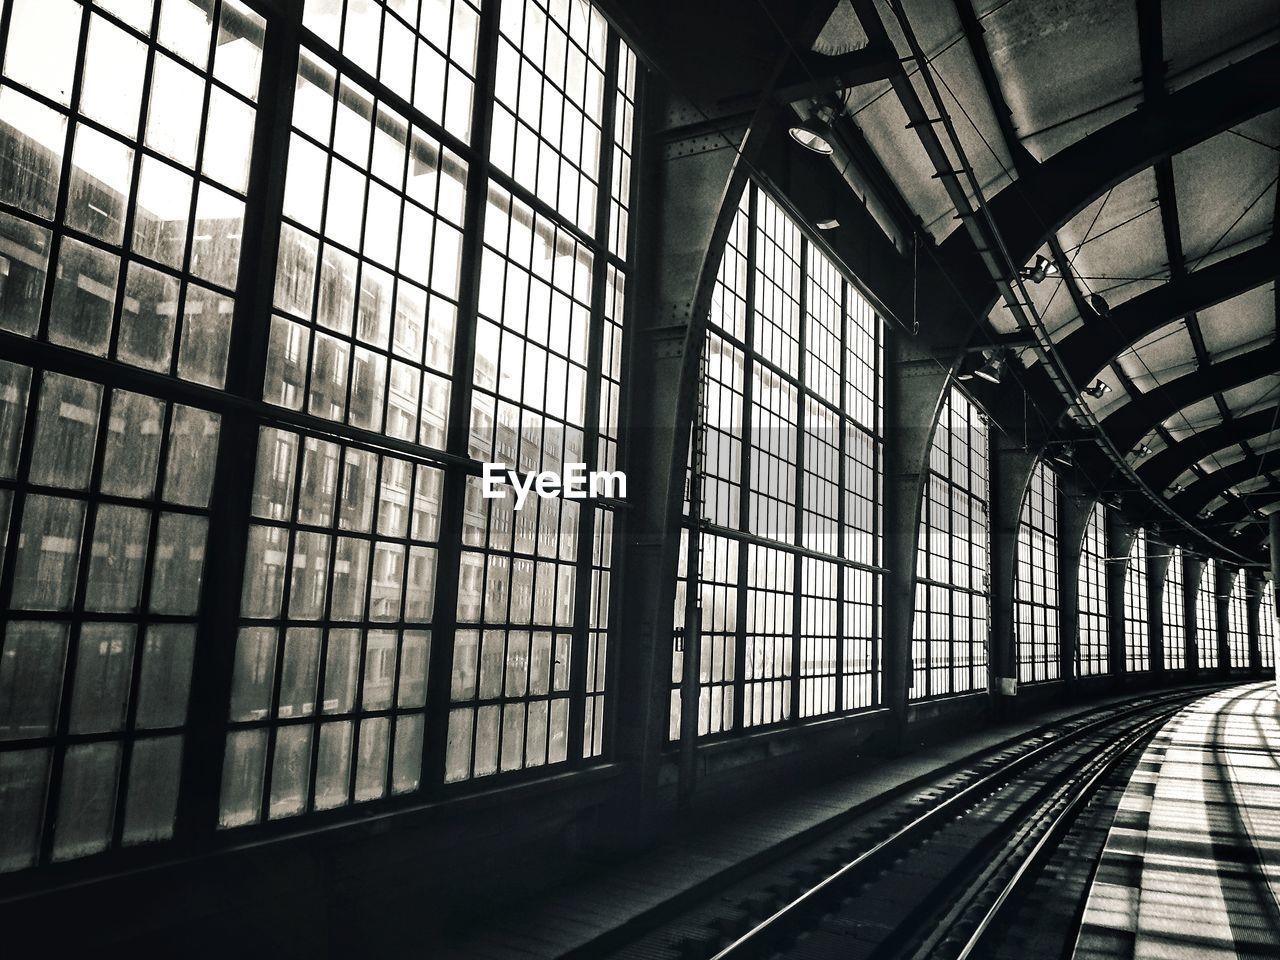 Railroad station platform seen through glass window